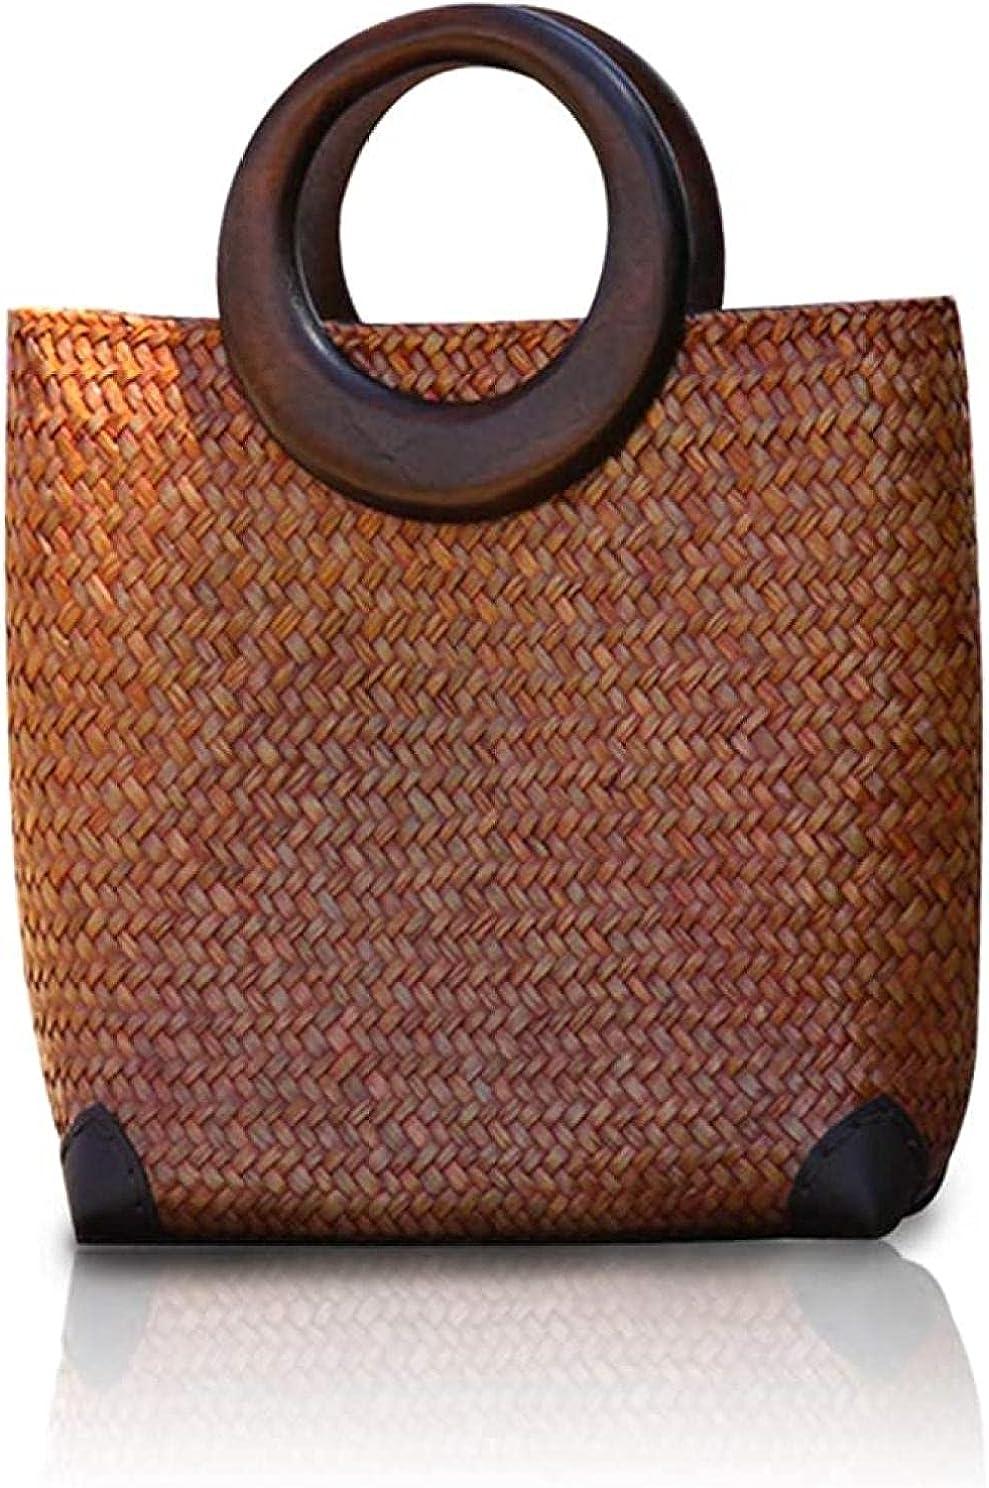 Hand-woven Womens Straw Phoenix Mall Large Boho Summer Bag Women Handbag Cheap sale for